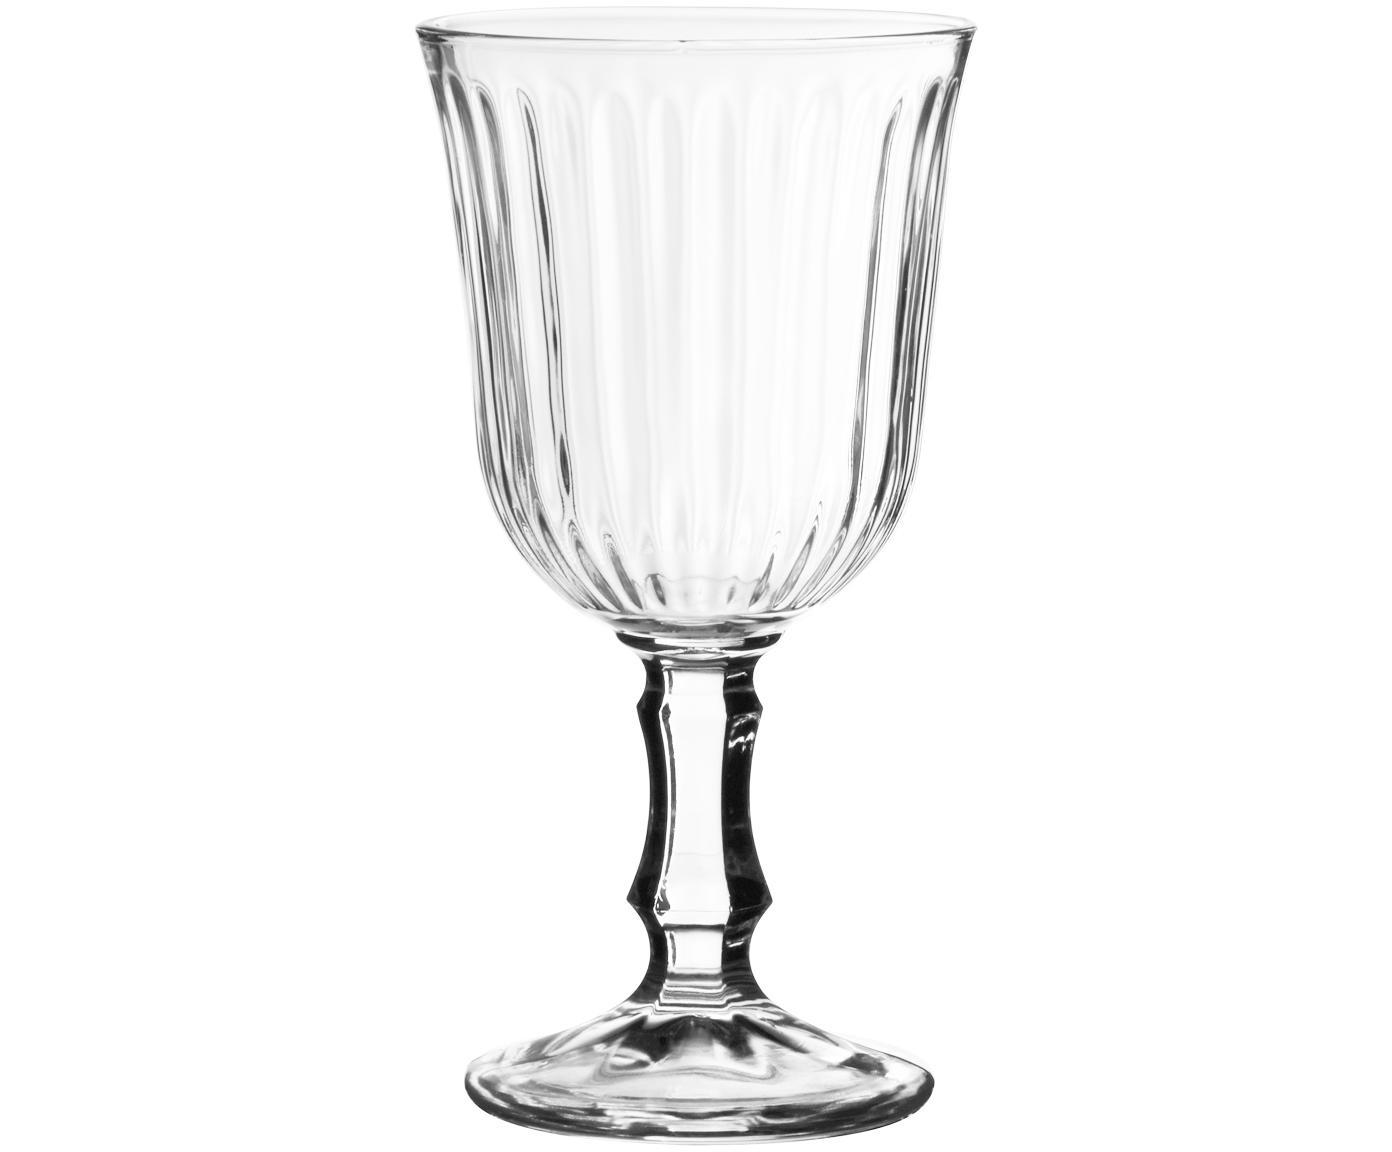 Wijnglazen Belem, 12 stuks, Glas, Transparant, 180 ml